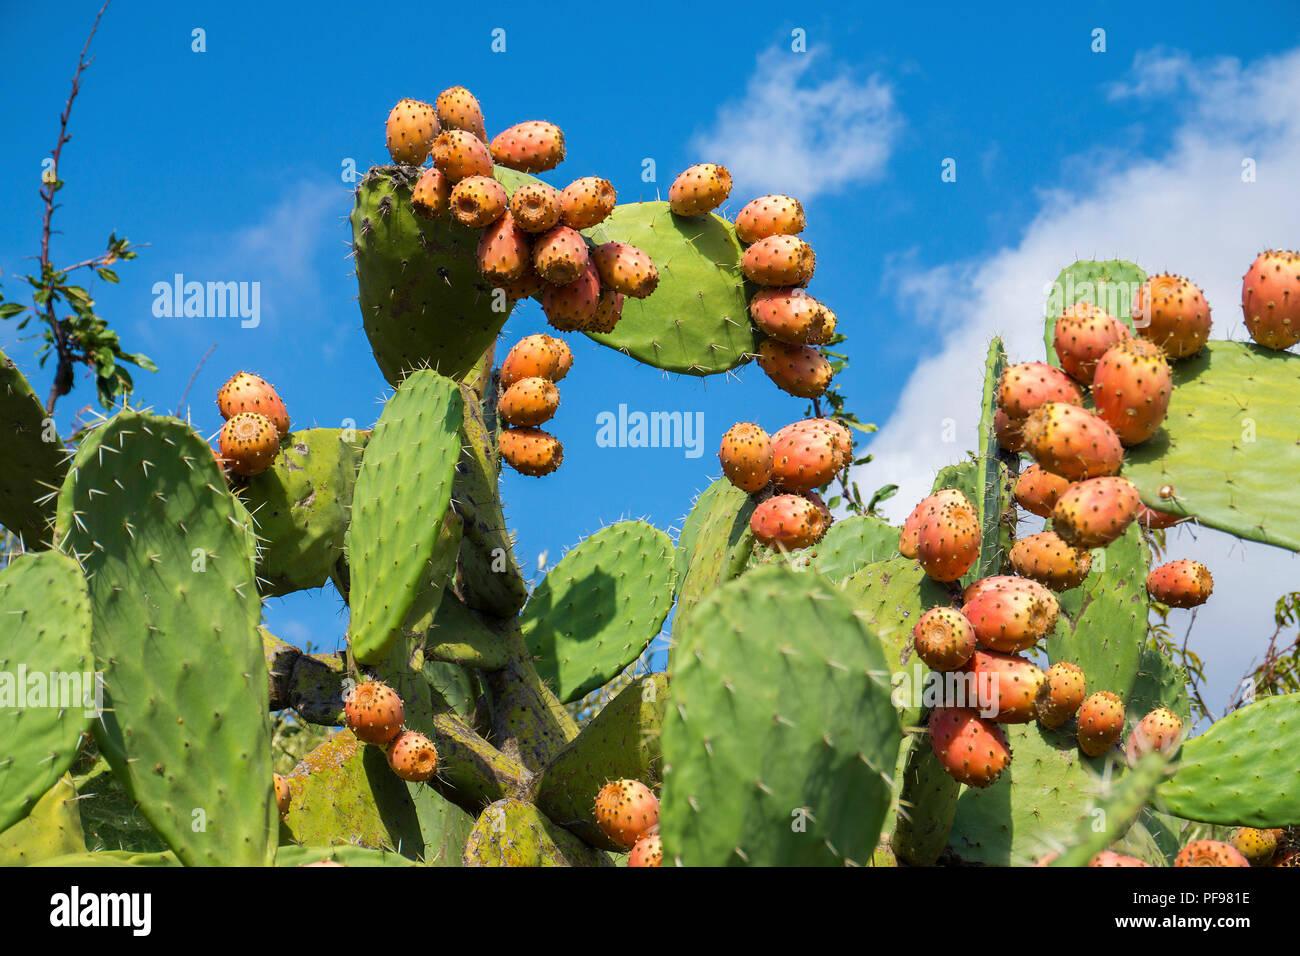 Cactus pears (Opuntia ficus-indica) with orange ferns, province Olbia-Tempio, Gallura, Sardinia, Italy - Stock Image